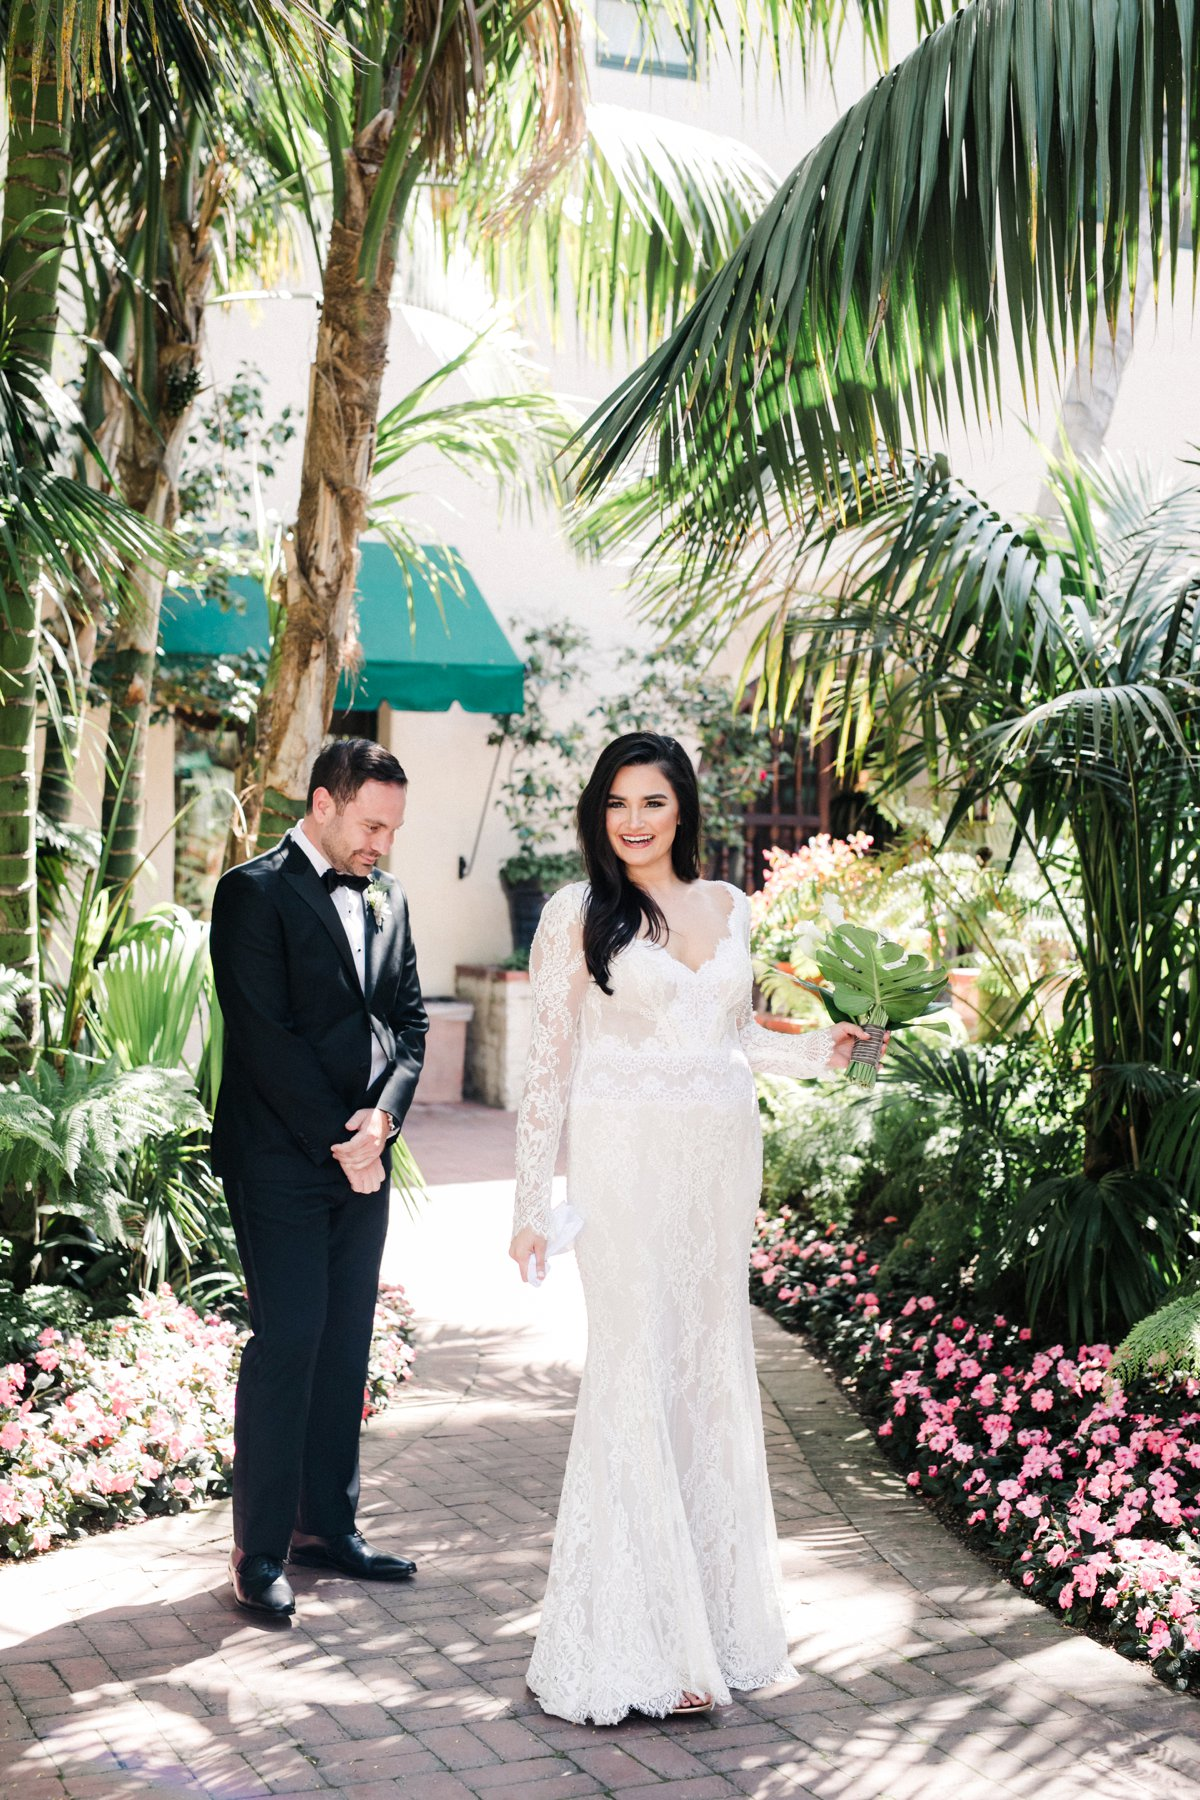 wedding first looks - photo by Anna Delores http://ruffledblog.com/chic-modern-wedding-at-four-seasons-santa-barbara